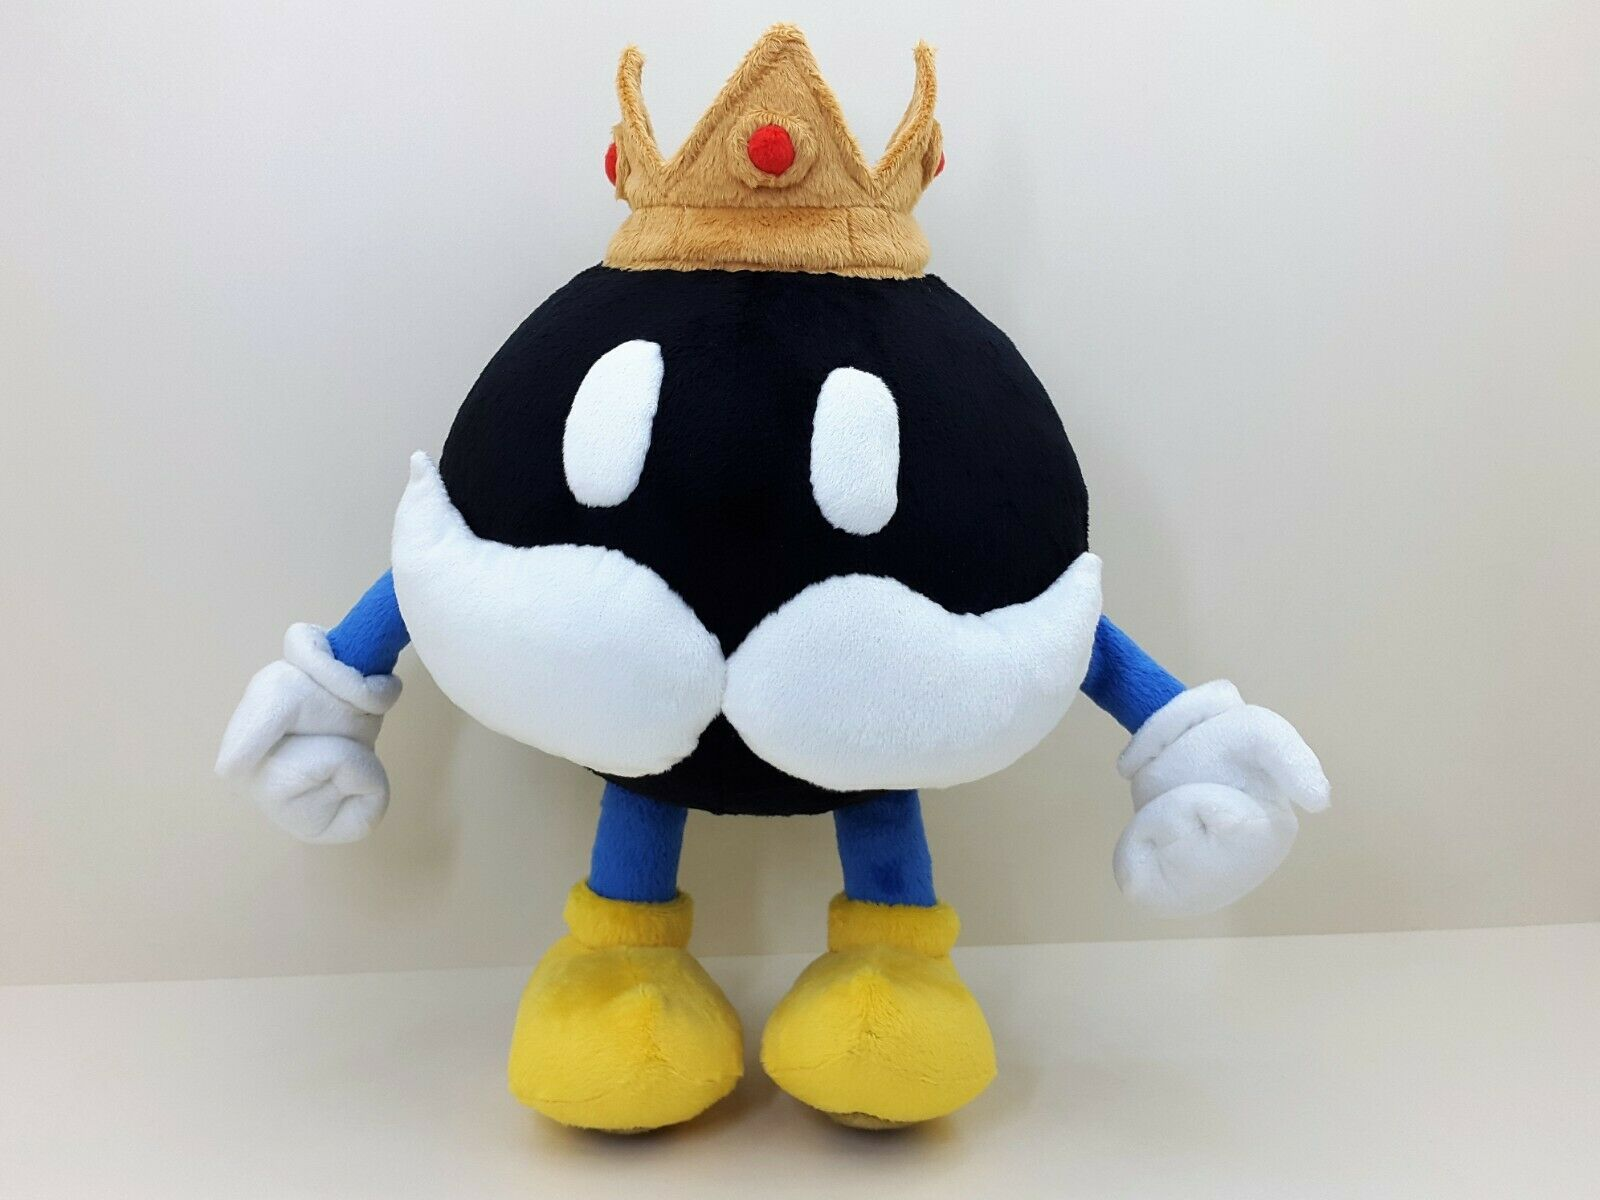 King Bob-omb Bob-omb plush Super Mario party paper mario